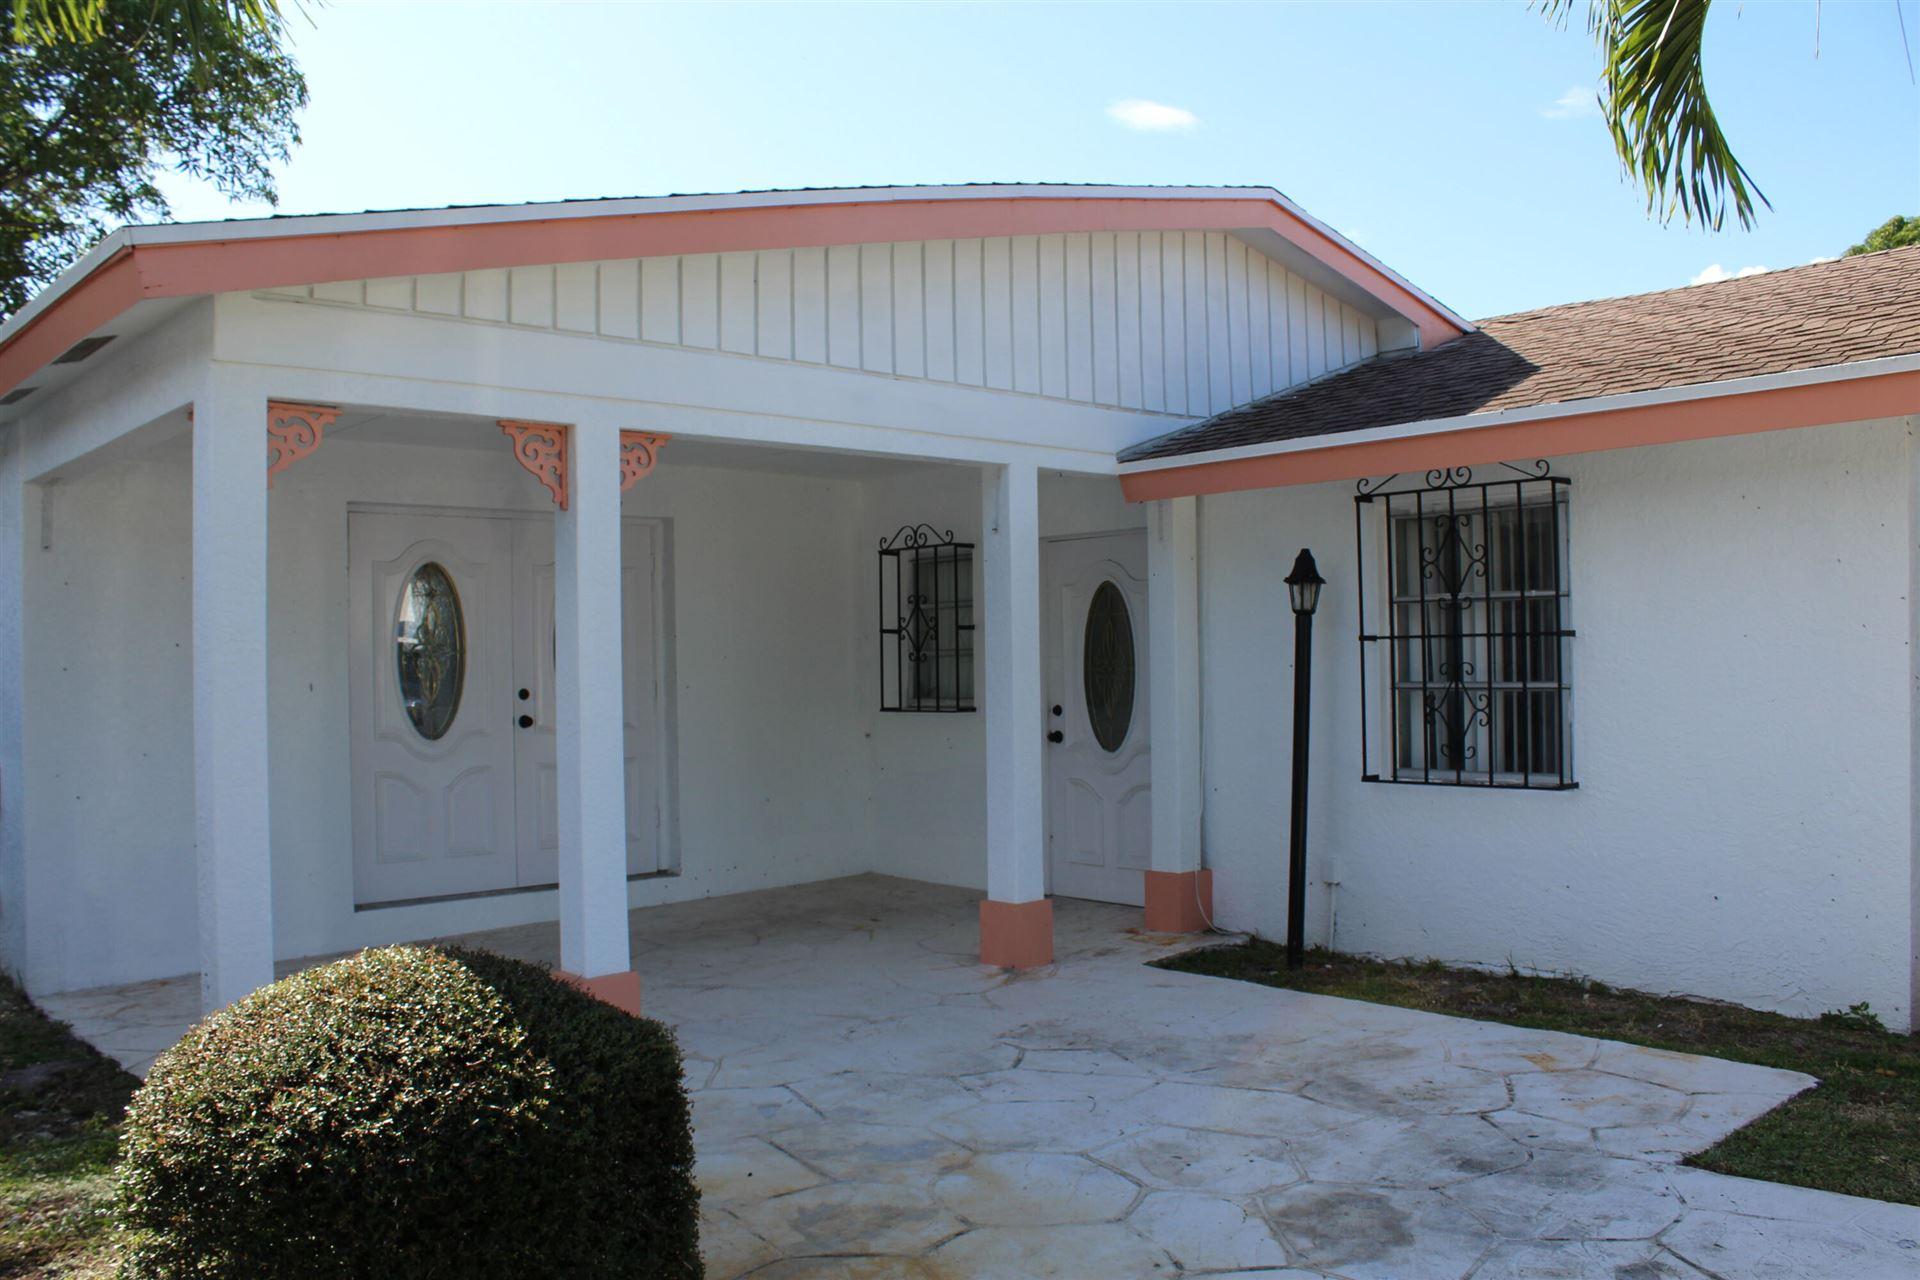 330 NW 7th Avenue, Delray Beach, FL 33444 - MLS#: RX-10753011